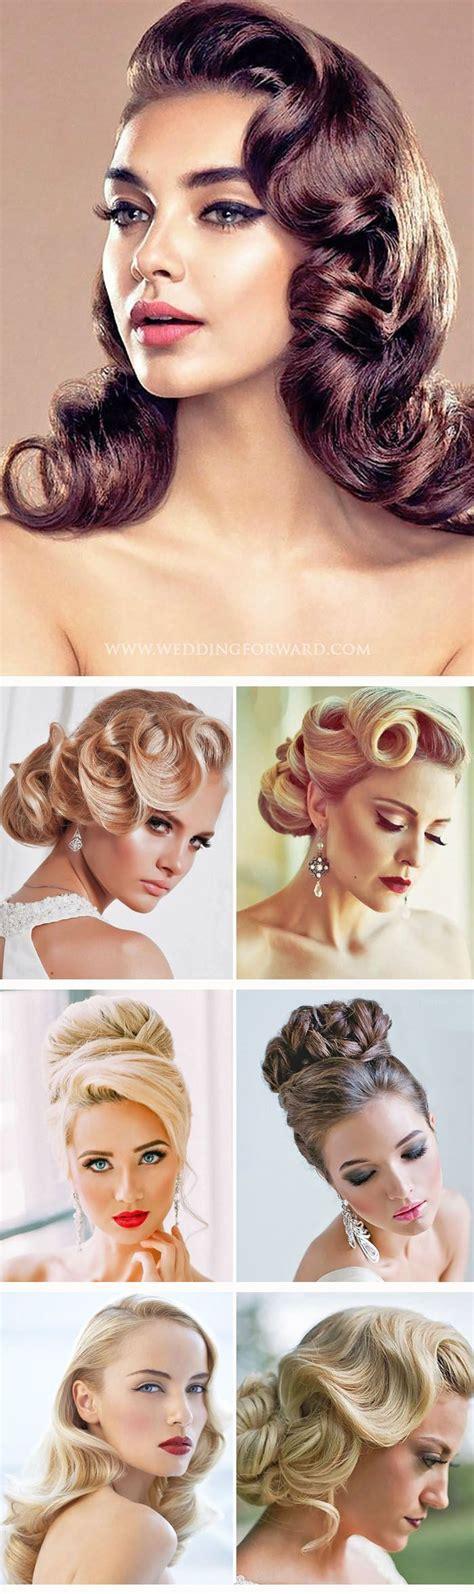 50s updo hairstyles best 25 vintage hairstyles ideas on pinterest